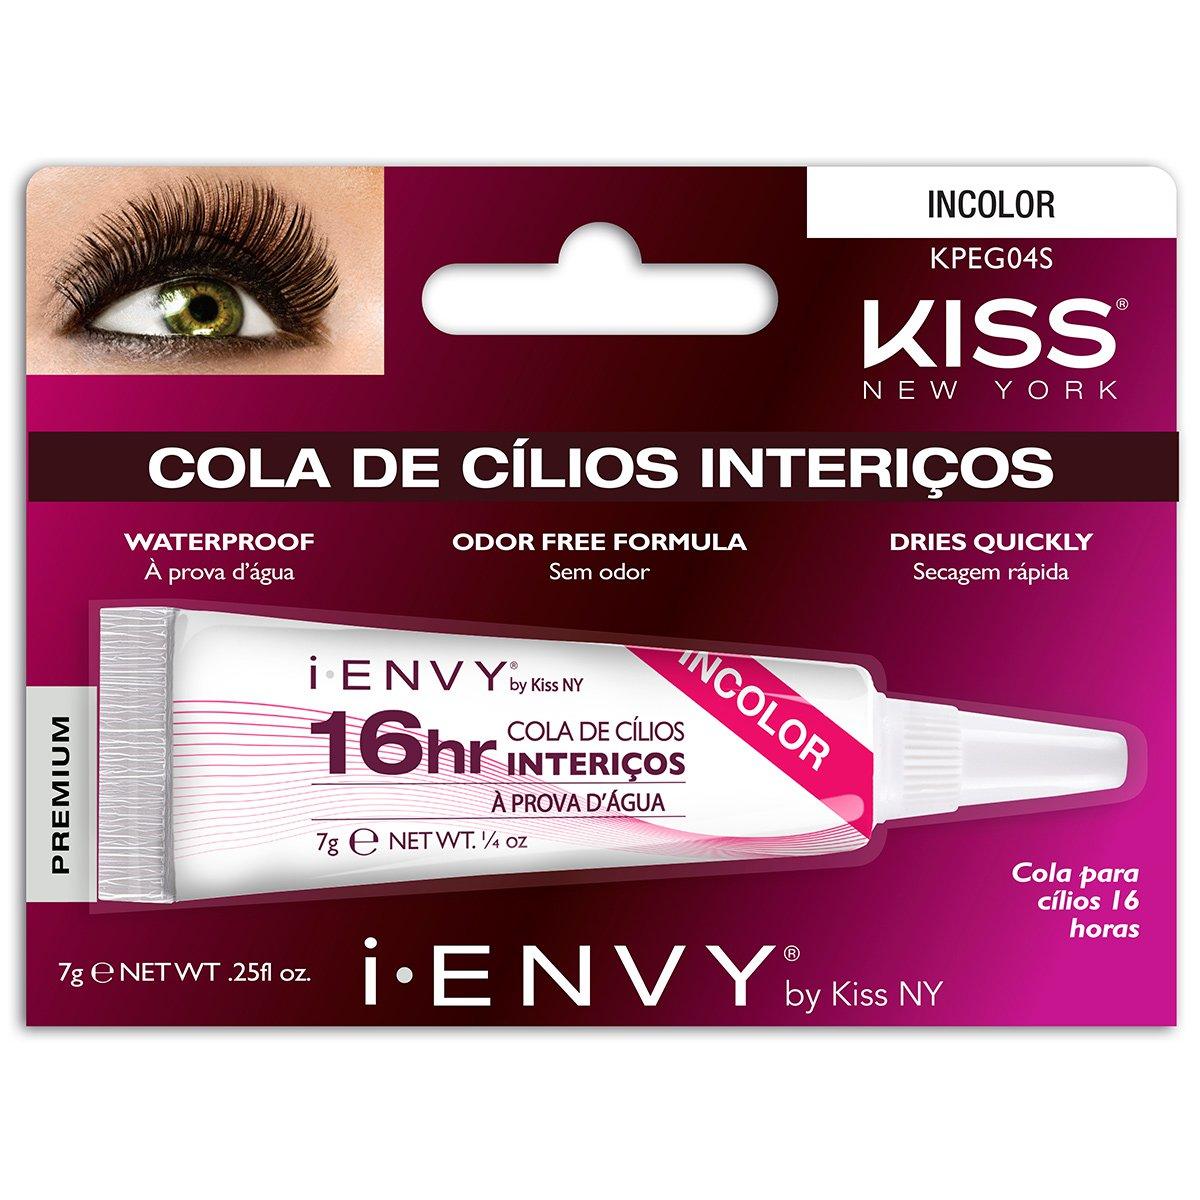 Cola para Cílios Postiços i-ENVY by Kiss NY 16 horas